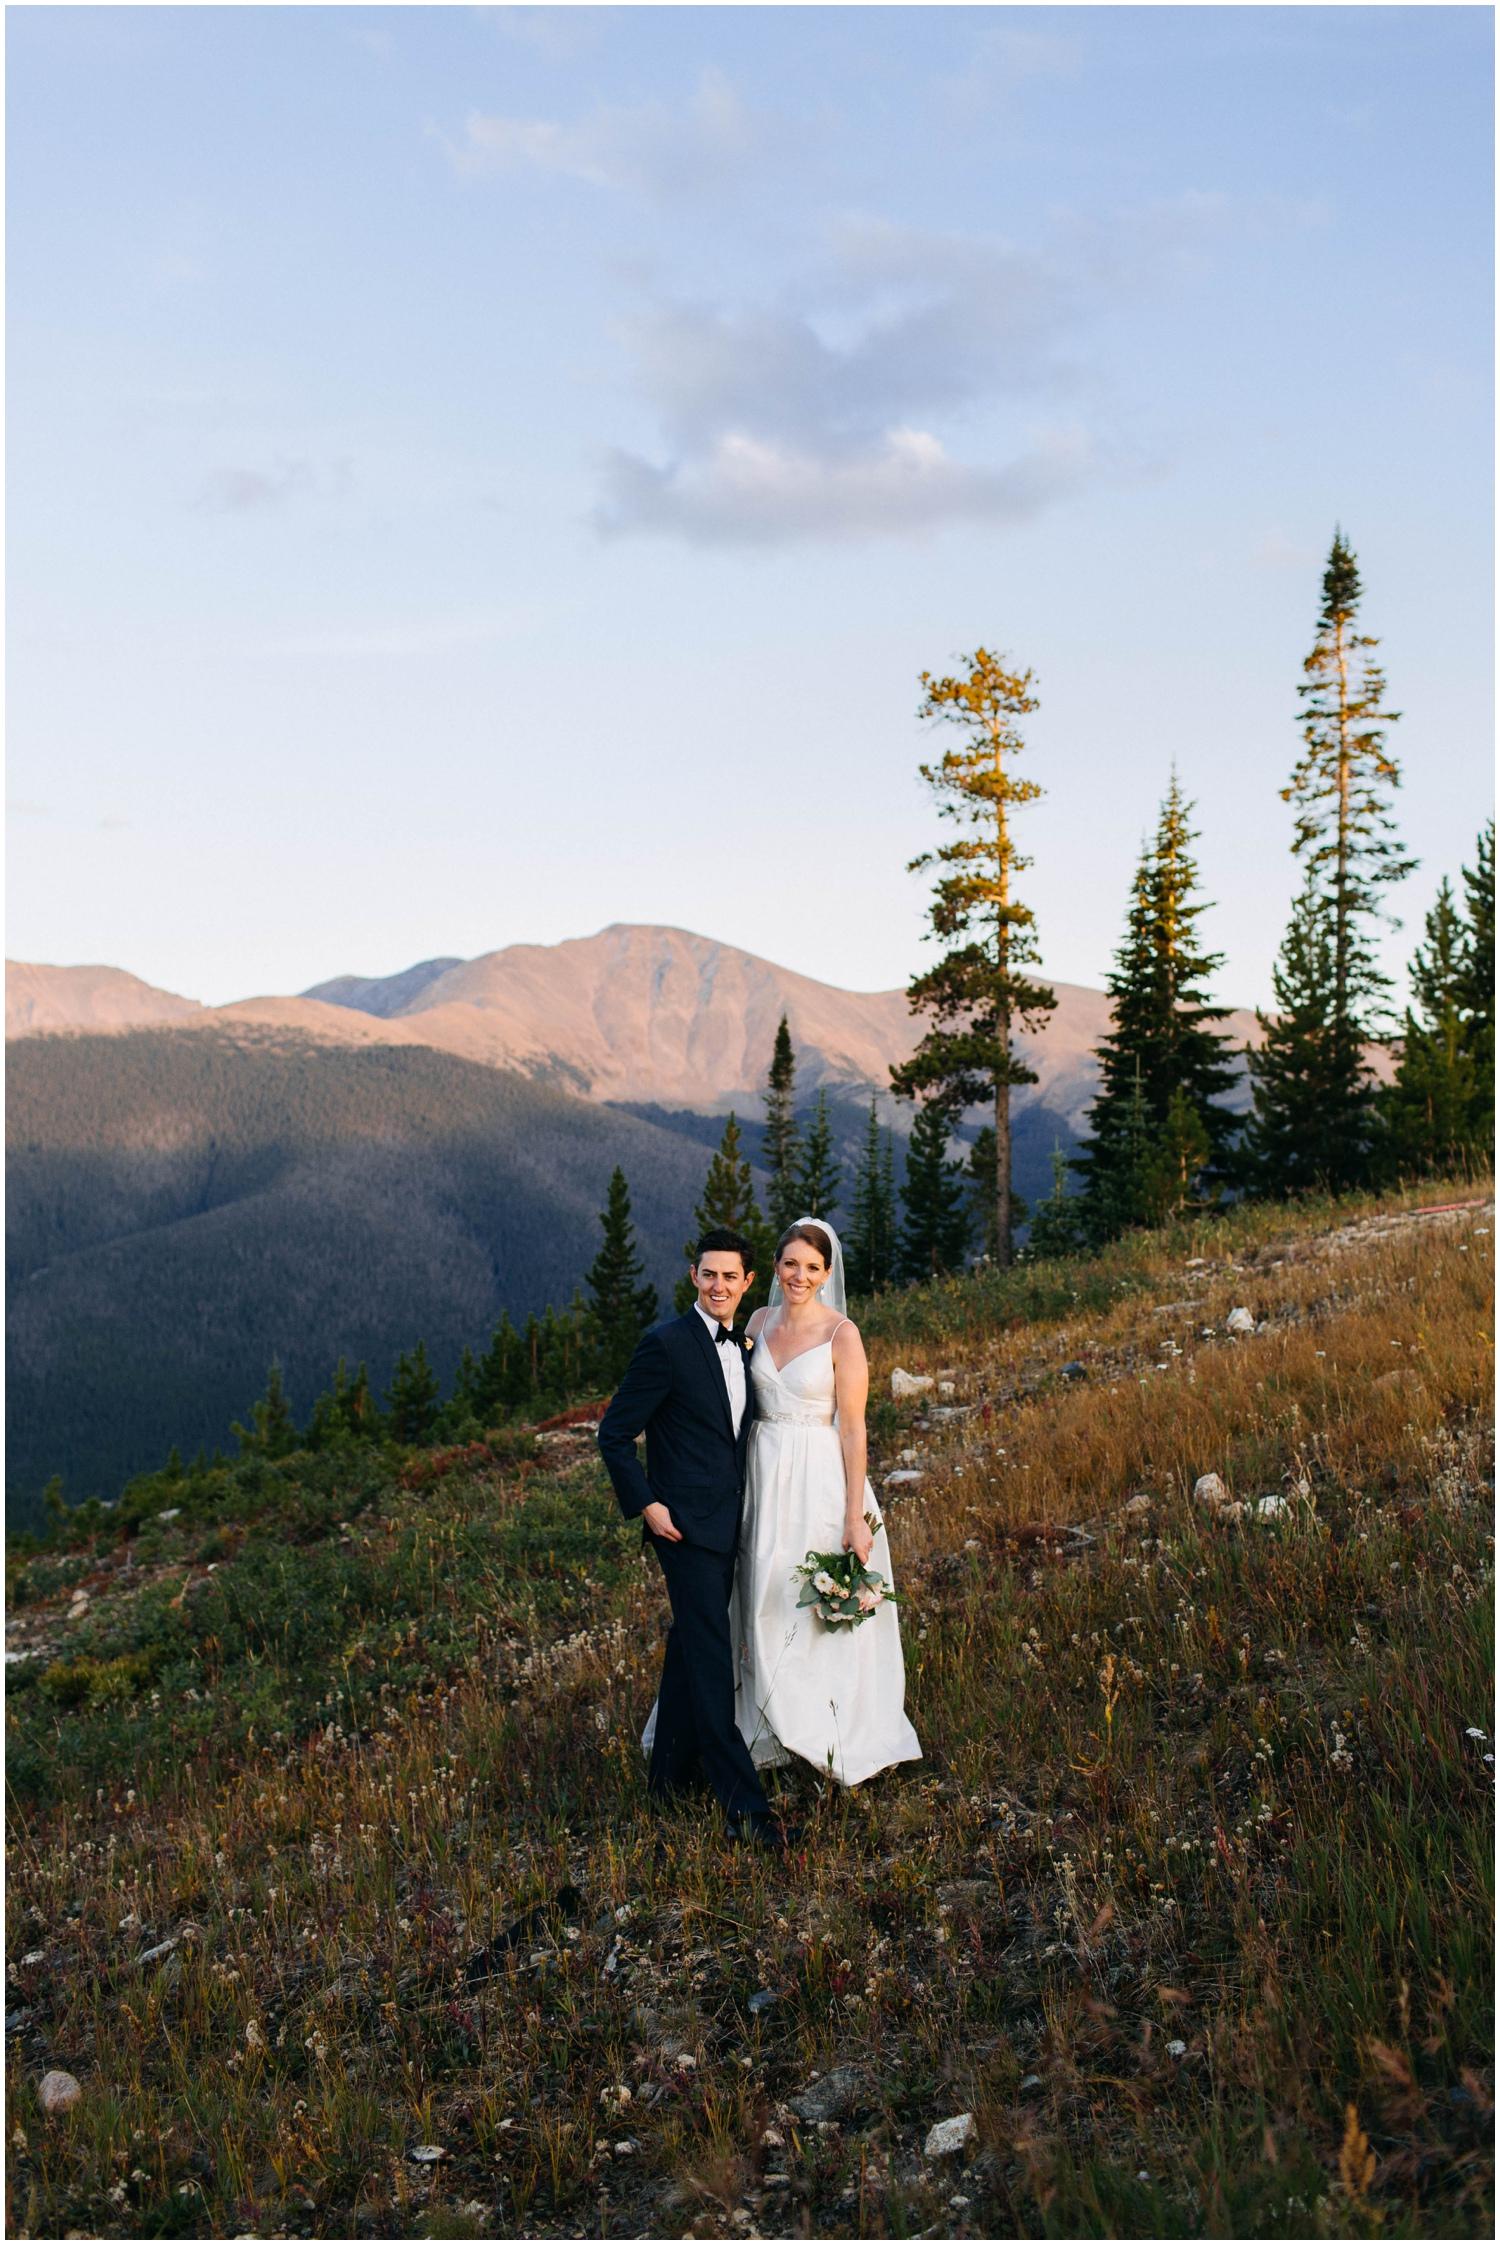 NadegeandJoe_elegant_winter_park_wedding_lodge_at_sunspot_mountain_taylor_powers_0234.jpg